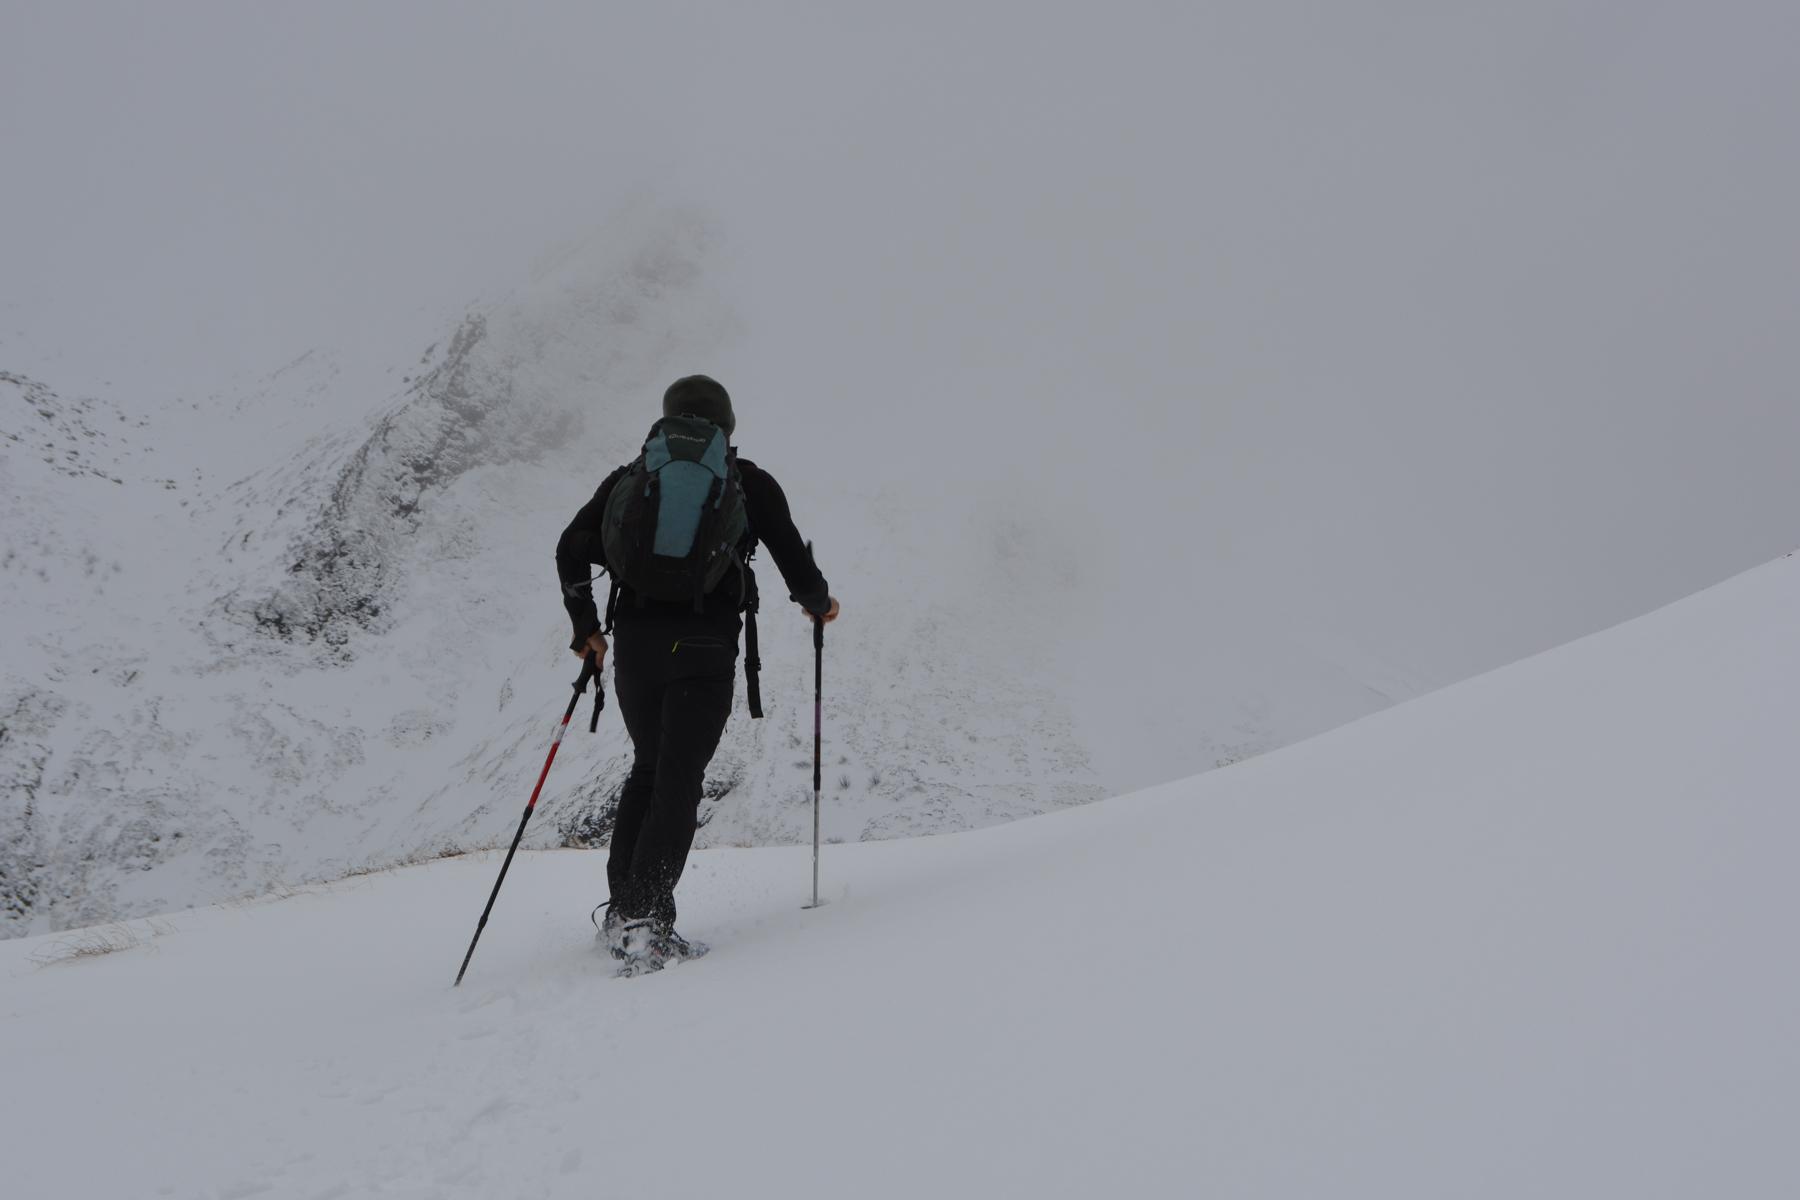 Ariège sous la neige, enfin ! 14